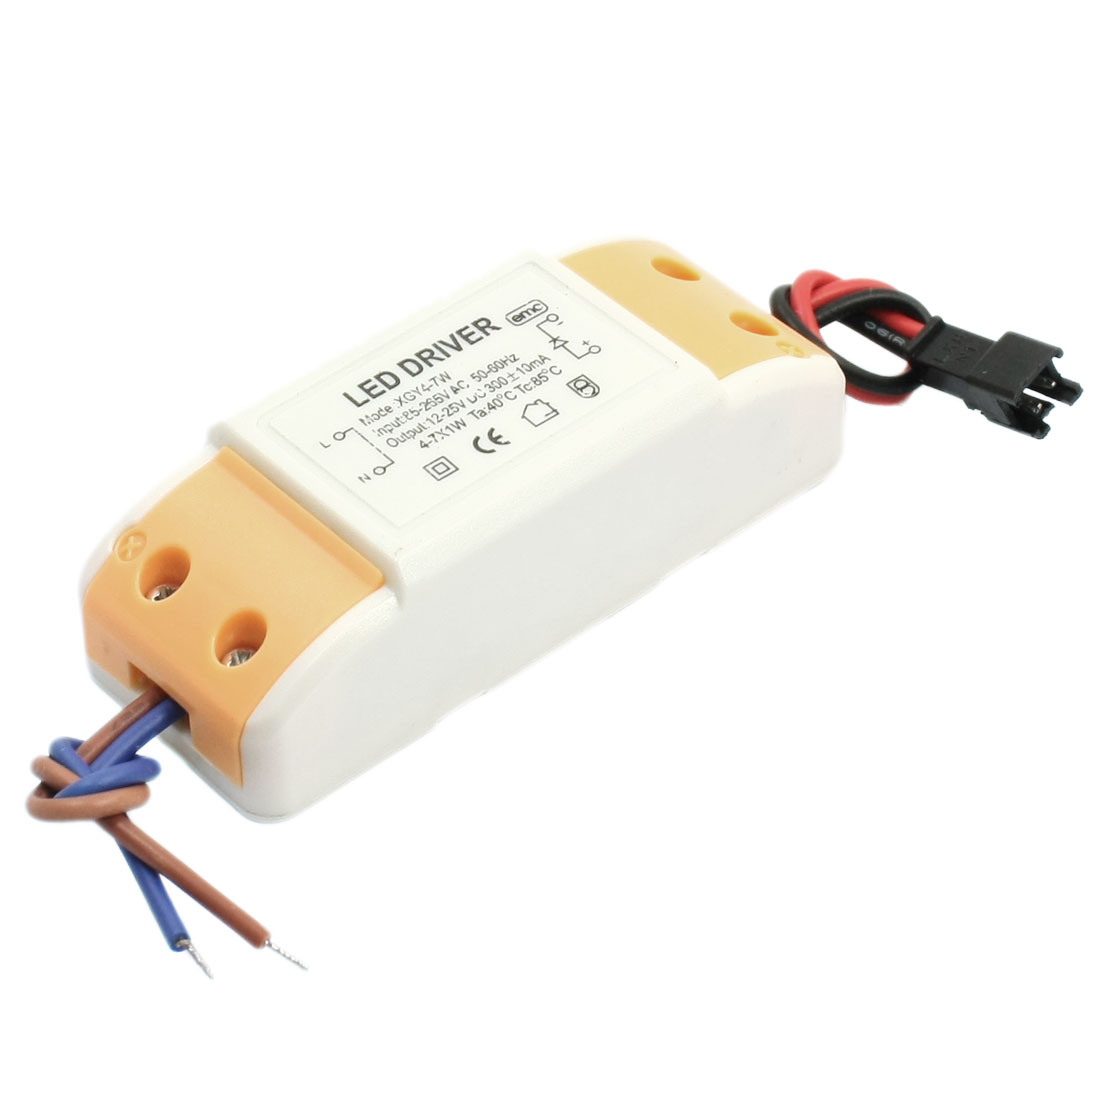 AC 85-265V to DC 12-25V 7W LED Driver Power Supply Transformer Adapter